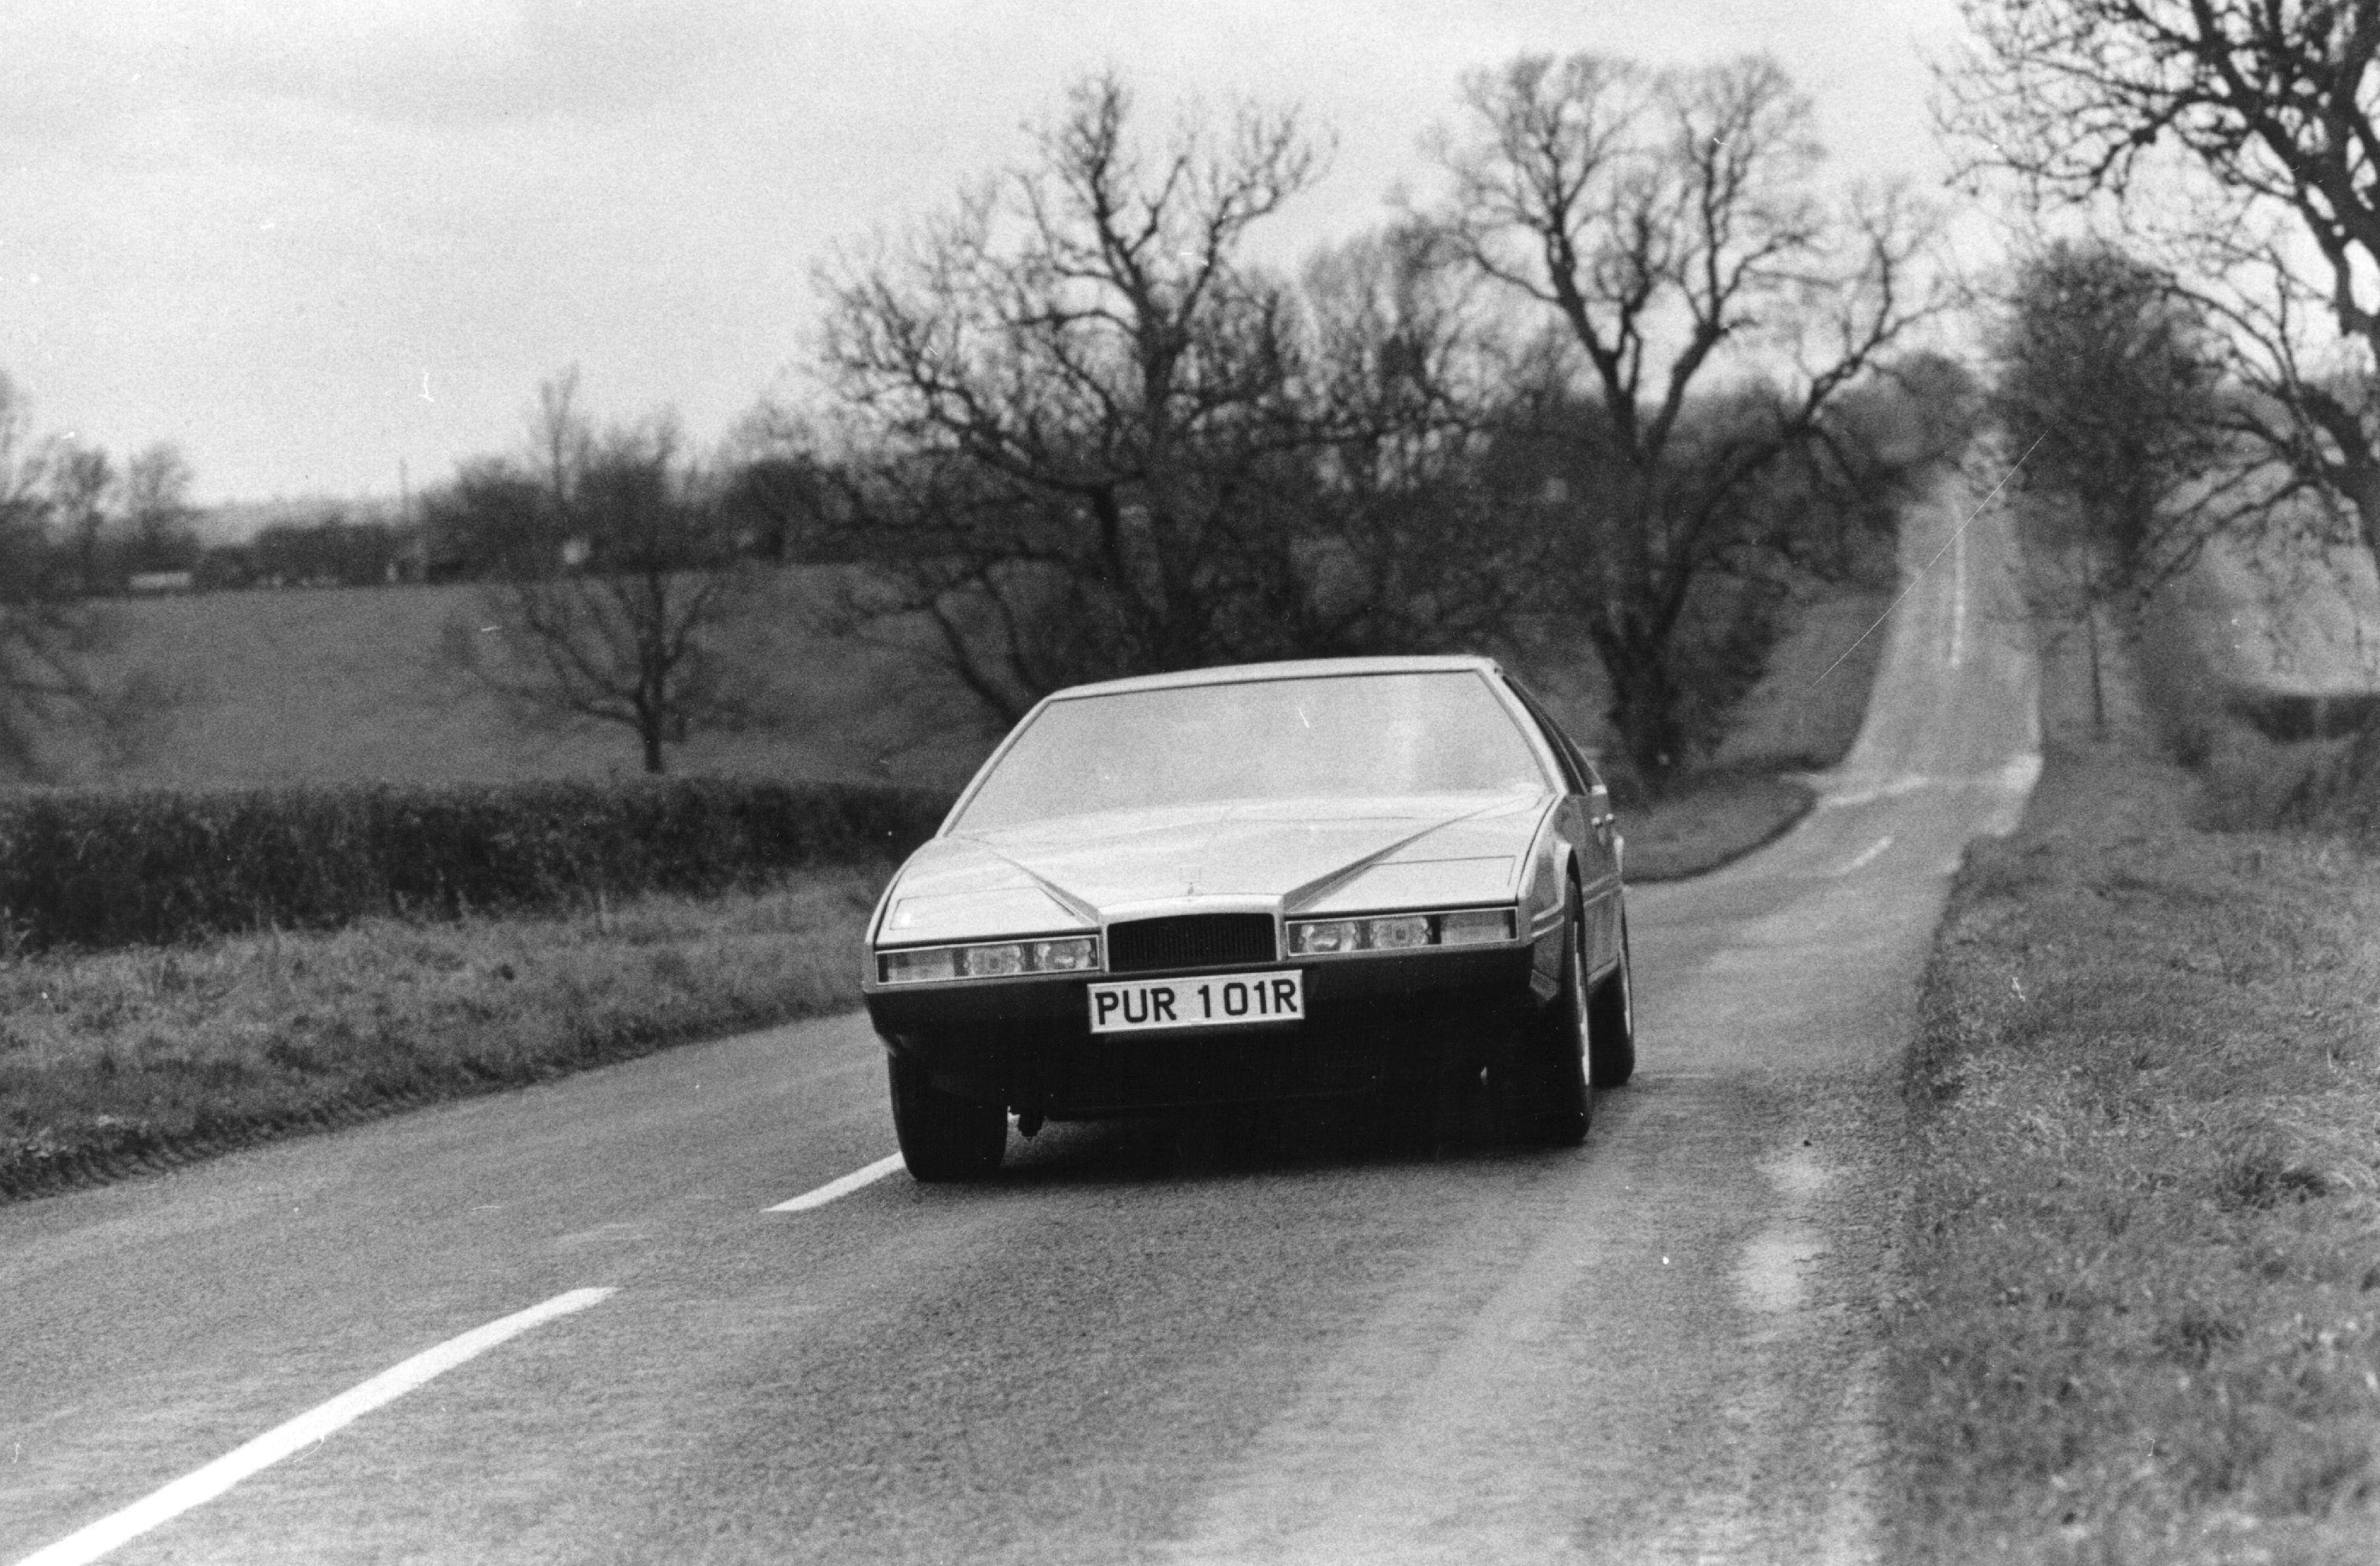 1st December 1976: The latest Aston Martin - the Lagonda.